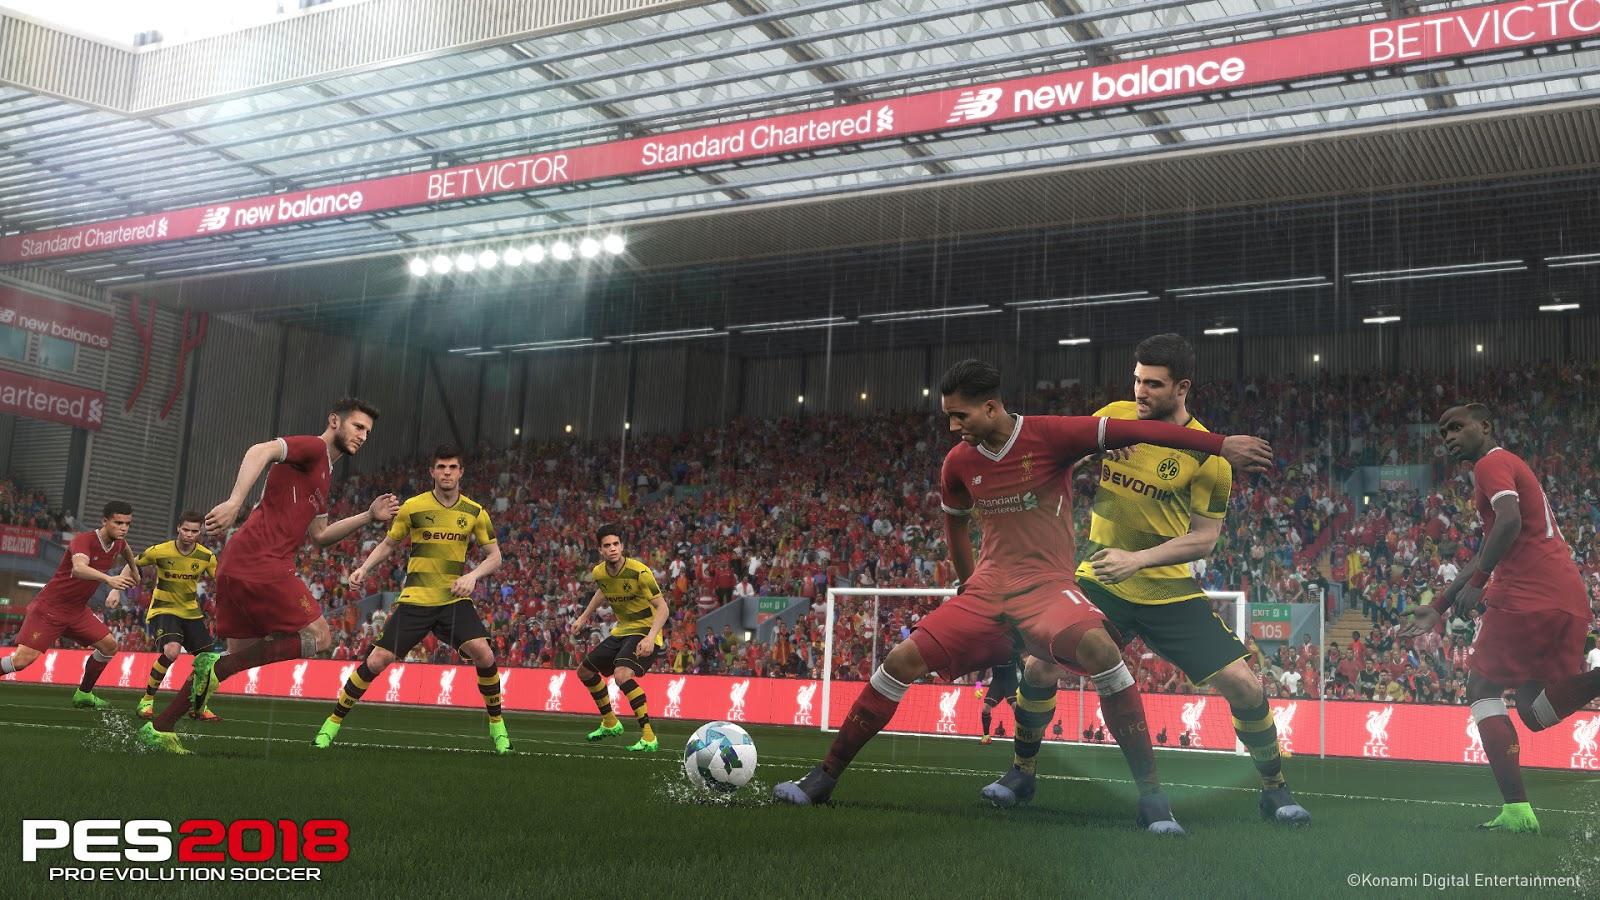 PES 2018 Liverpool Dortmund